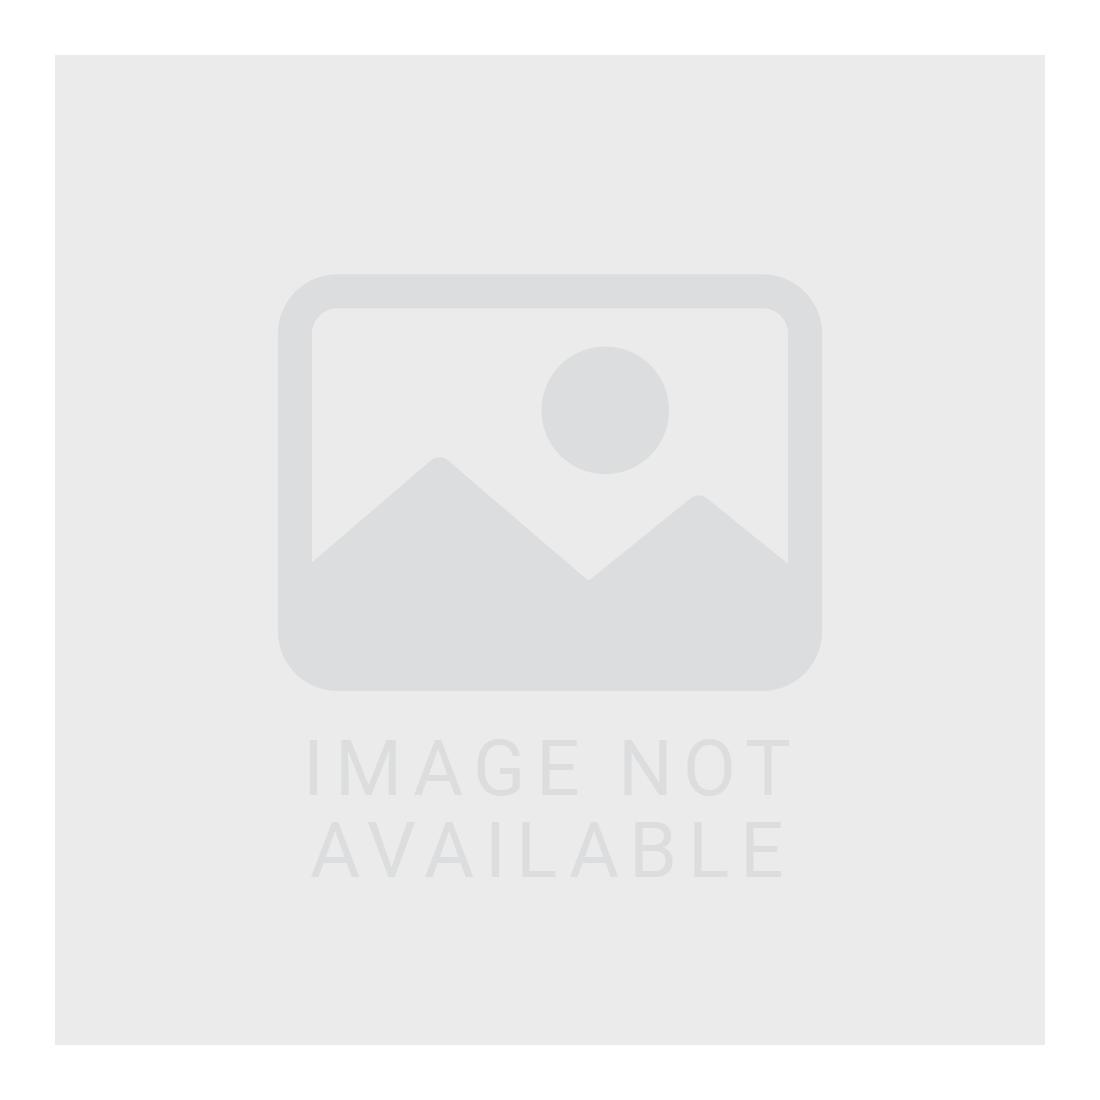 25L Urban Peak Backpack